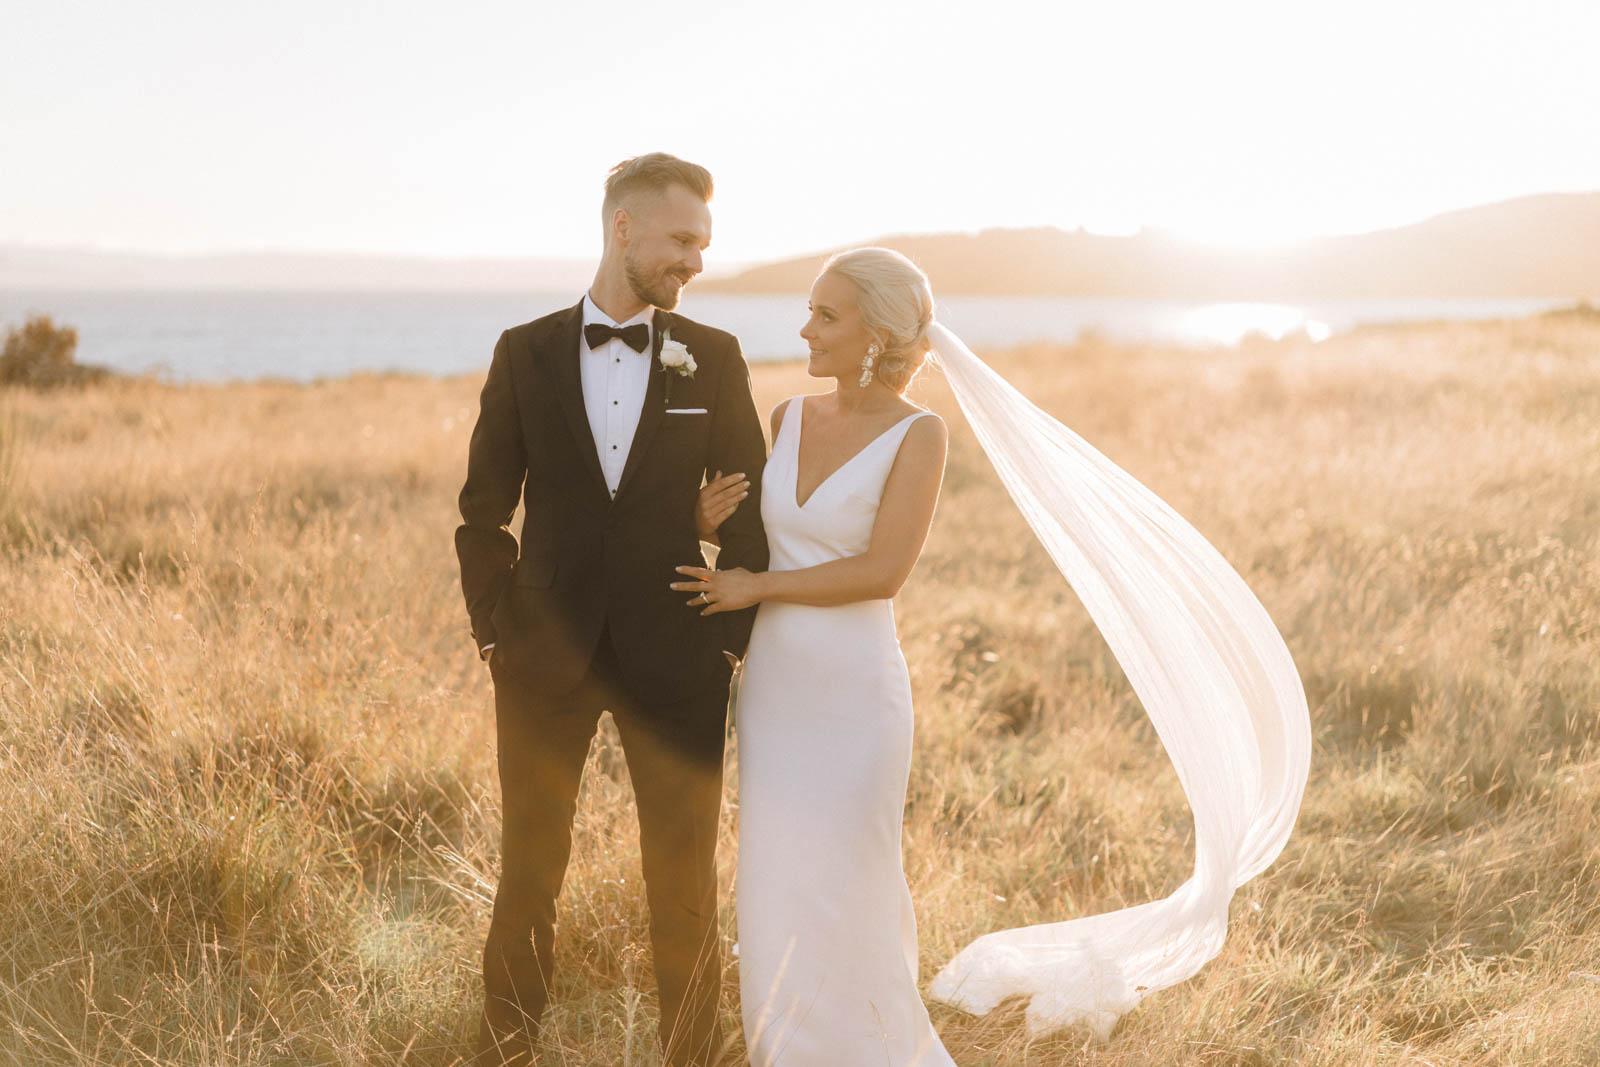 newfound-k-s-hilton-taupo-wedding-photographer-078